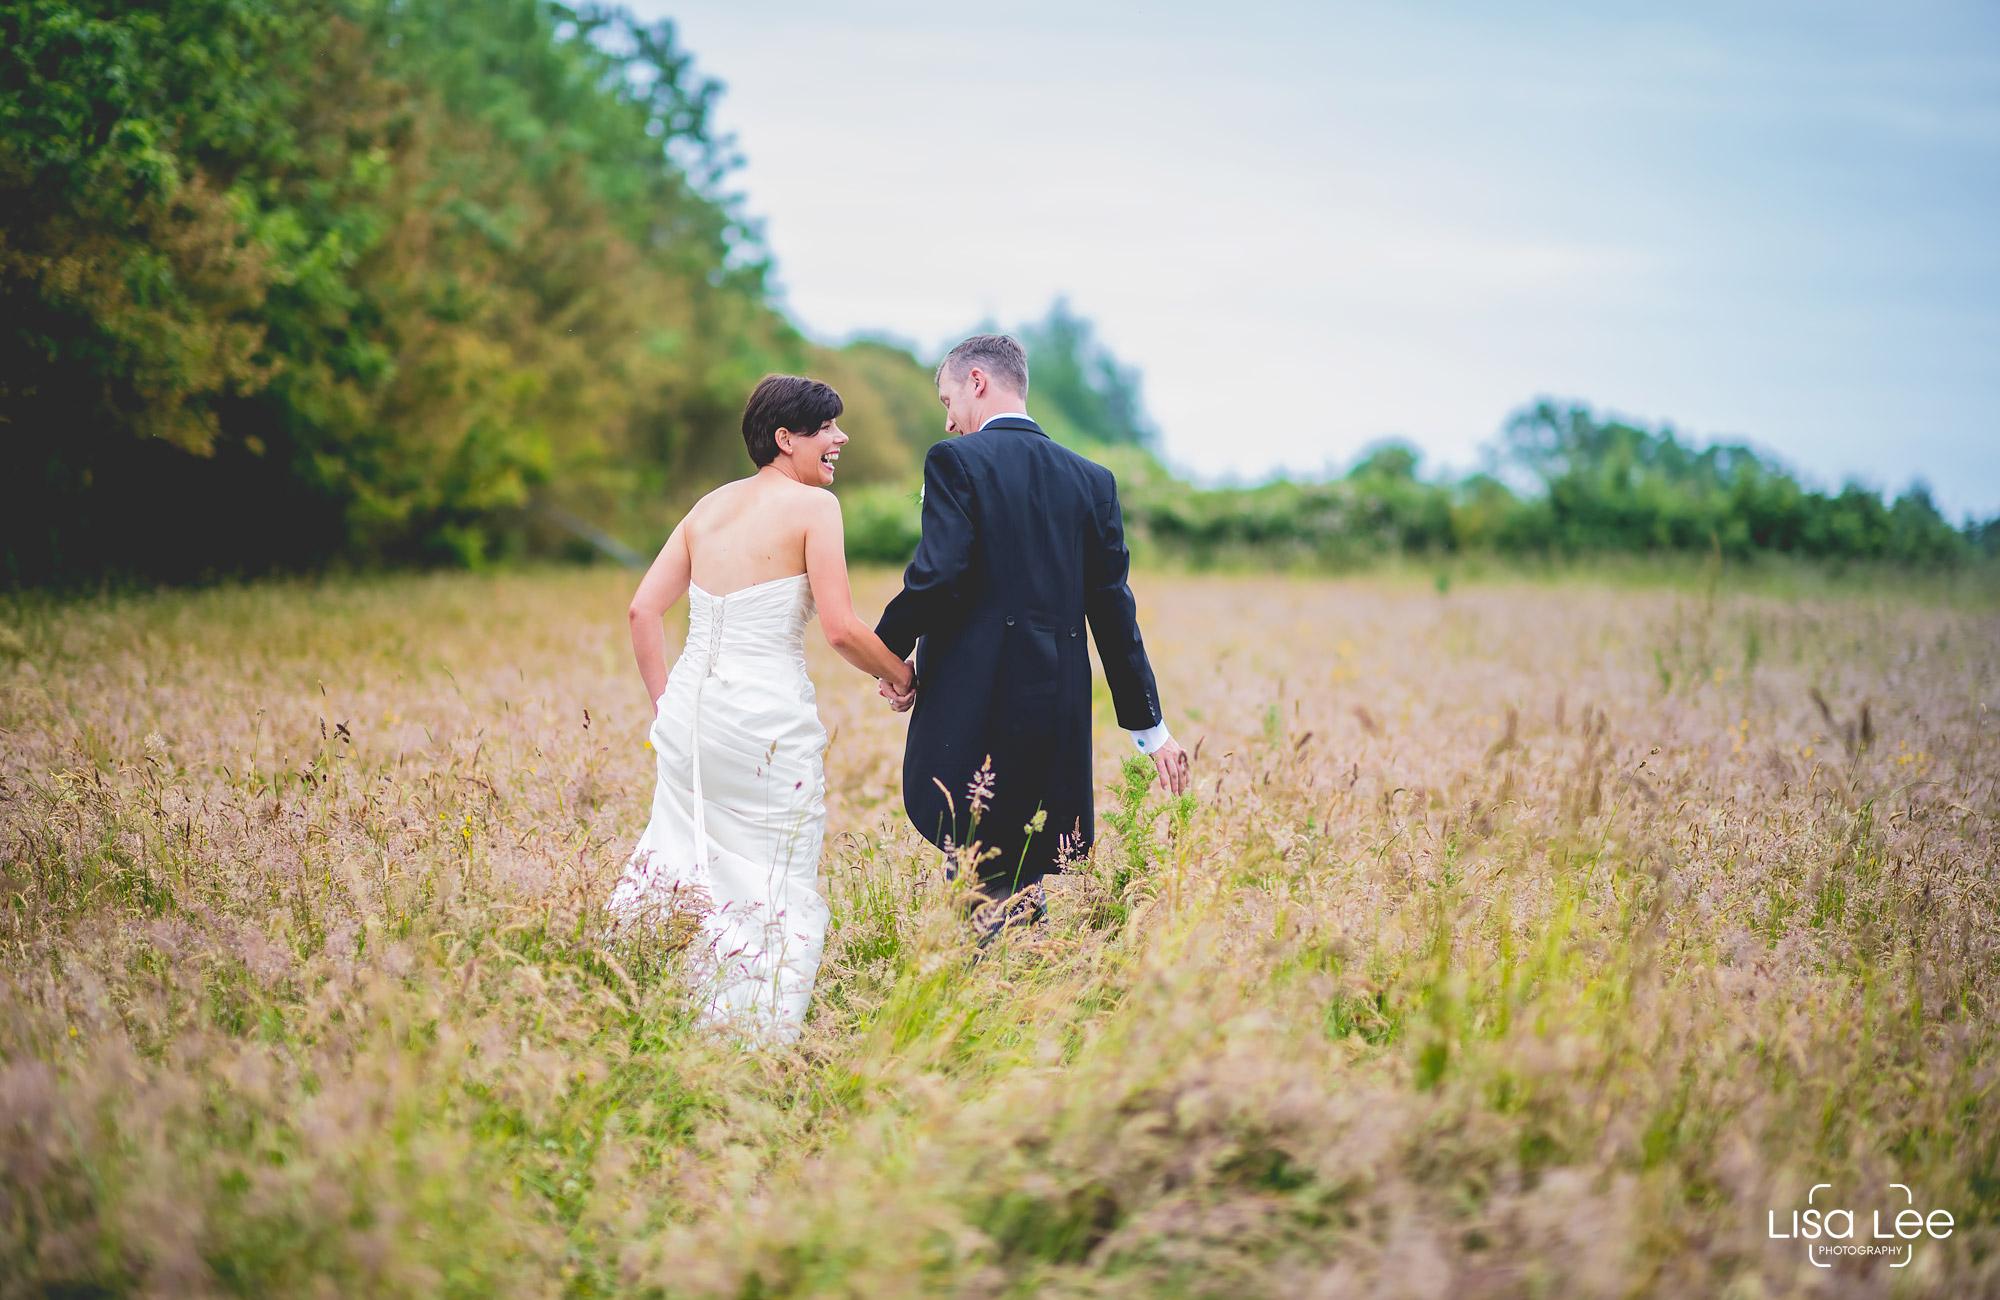 lisa-lee-wedding-photography-fields.jpg